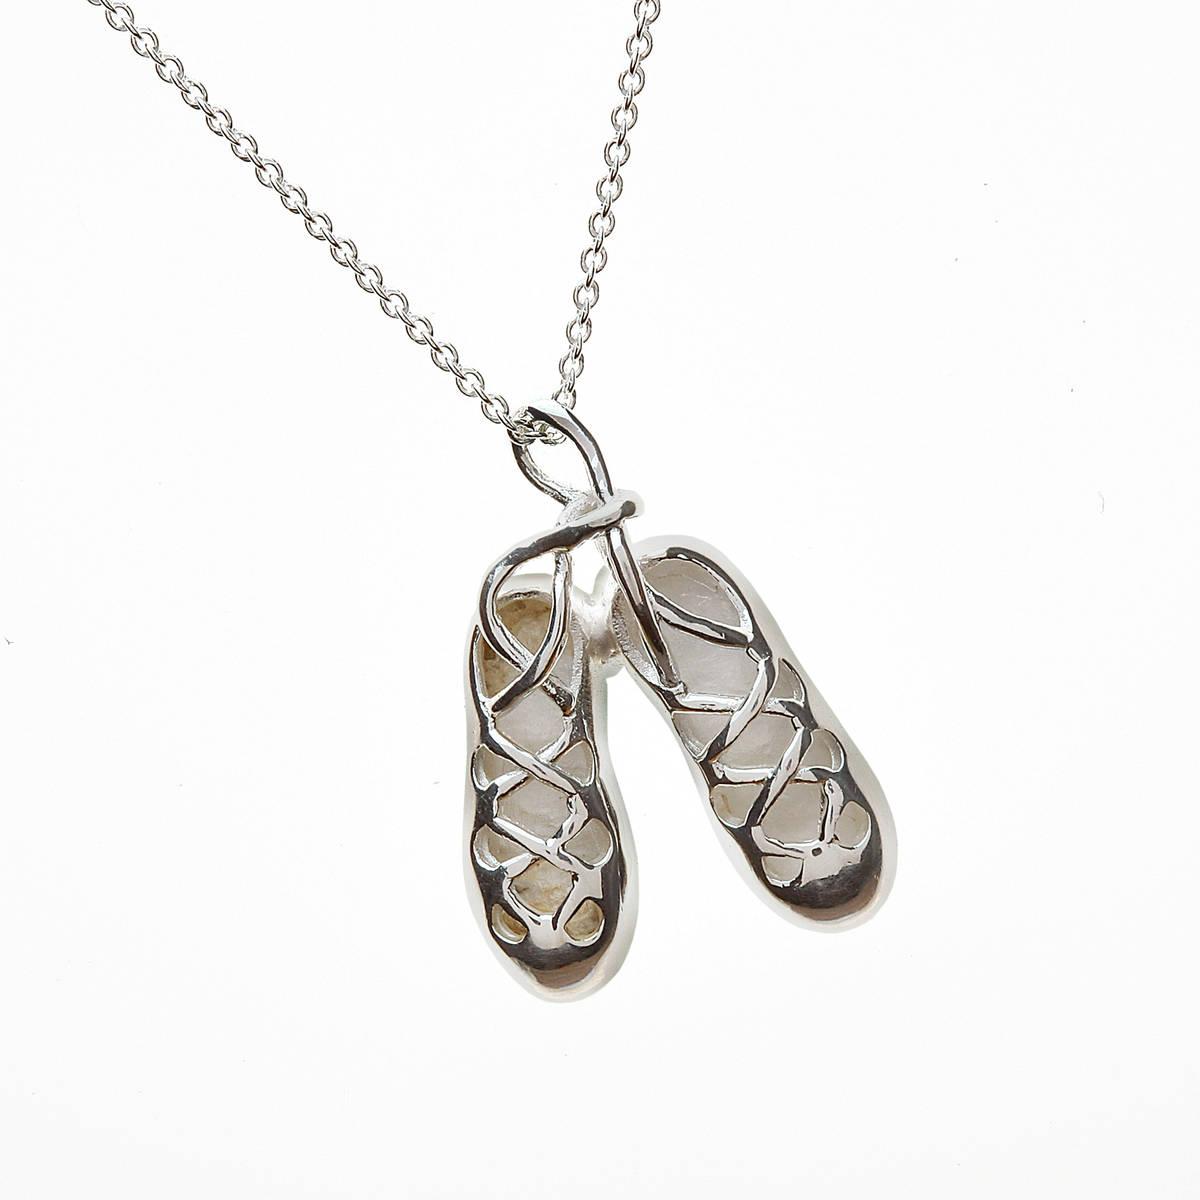 Silver Irish Dancing Shoes Pendant